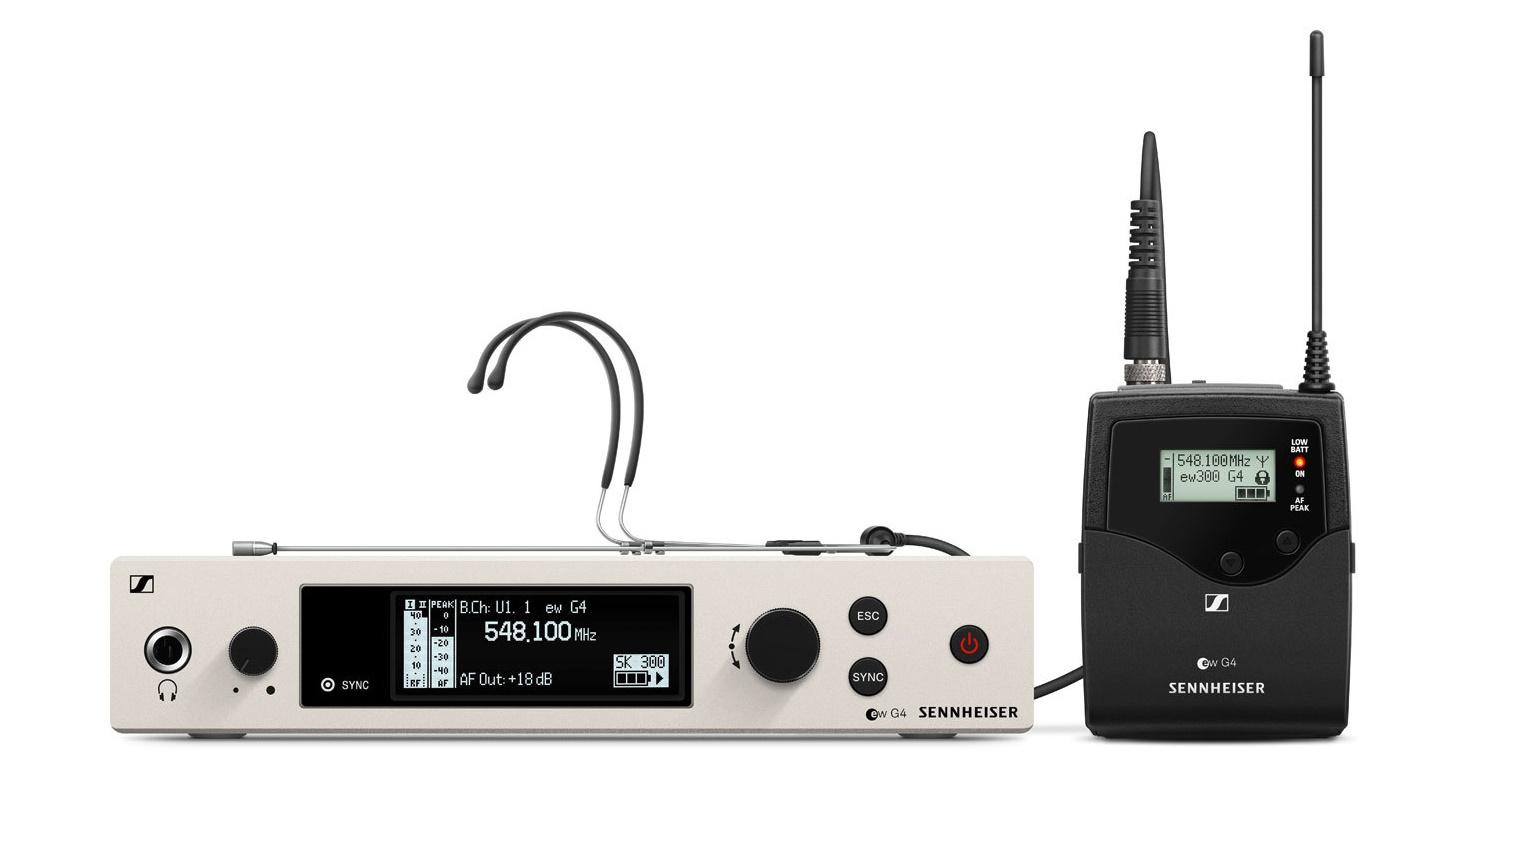 Sennheiser Ew 300 G4 Headmic 1-Rc Sistema Inalámbrico de Diadema